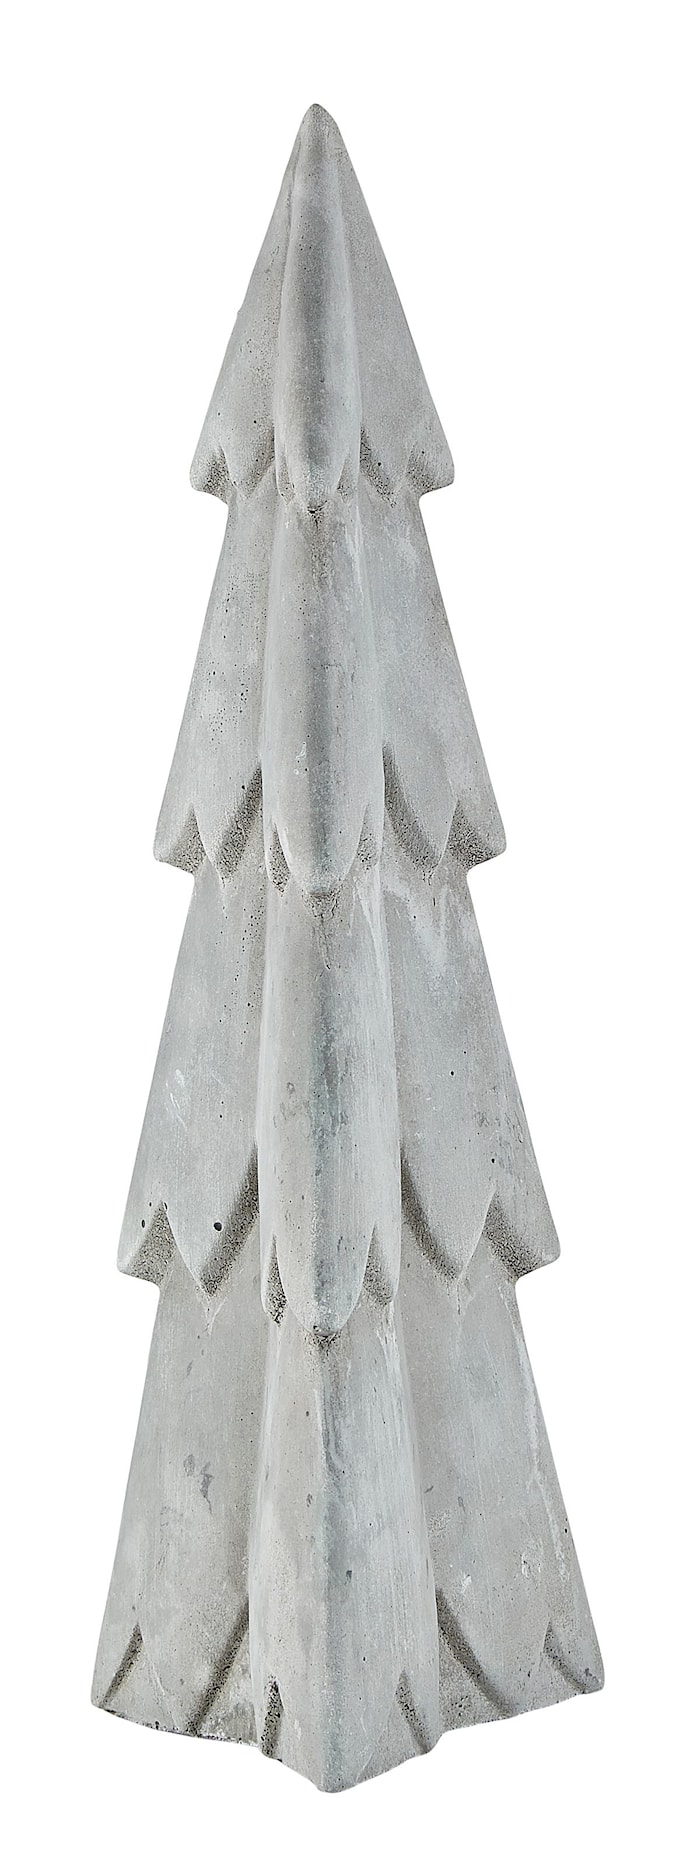 Figur - Træ - Cement - Grå - H 32,5cm - L 10,5cm - B 9,5cm - Stk.